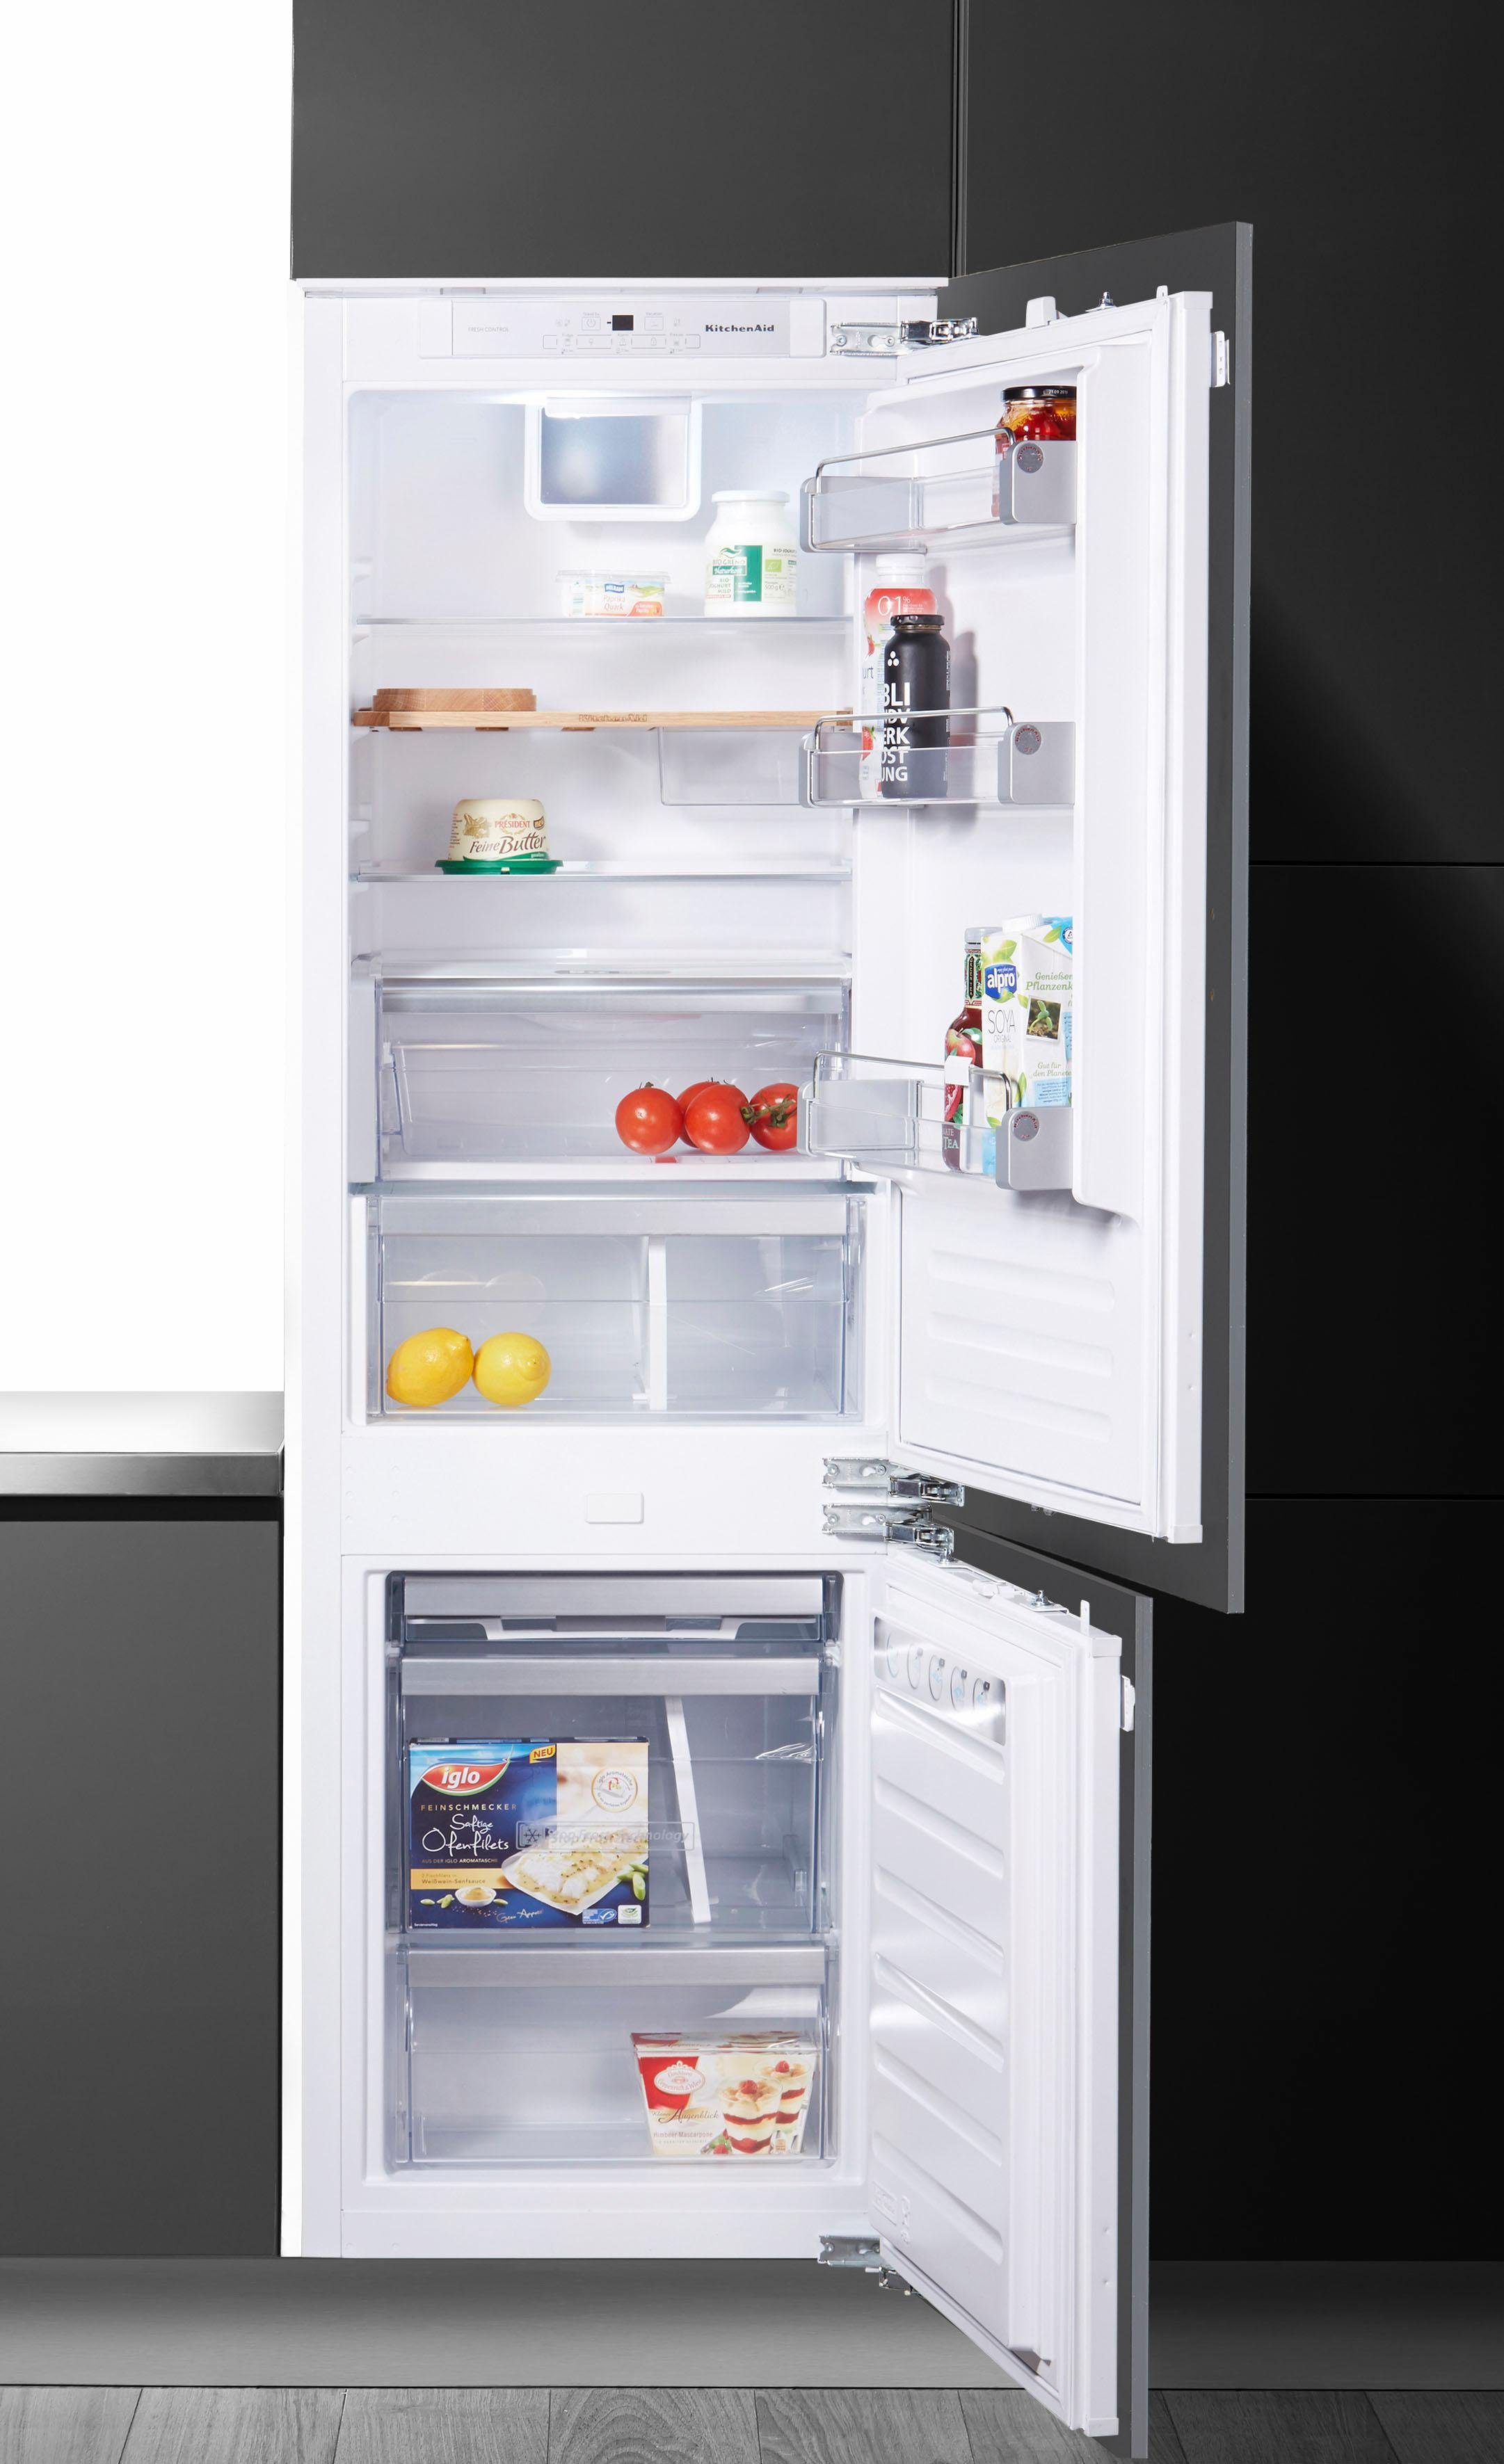 KitchenAid vollintegrierbare Einbau-Kühlgefrierkombination KCBDS 18601, Energieklasse A++